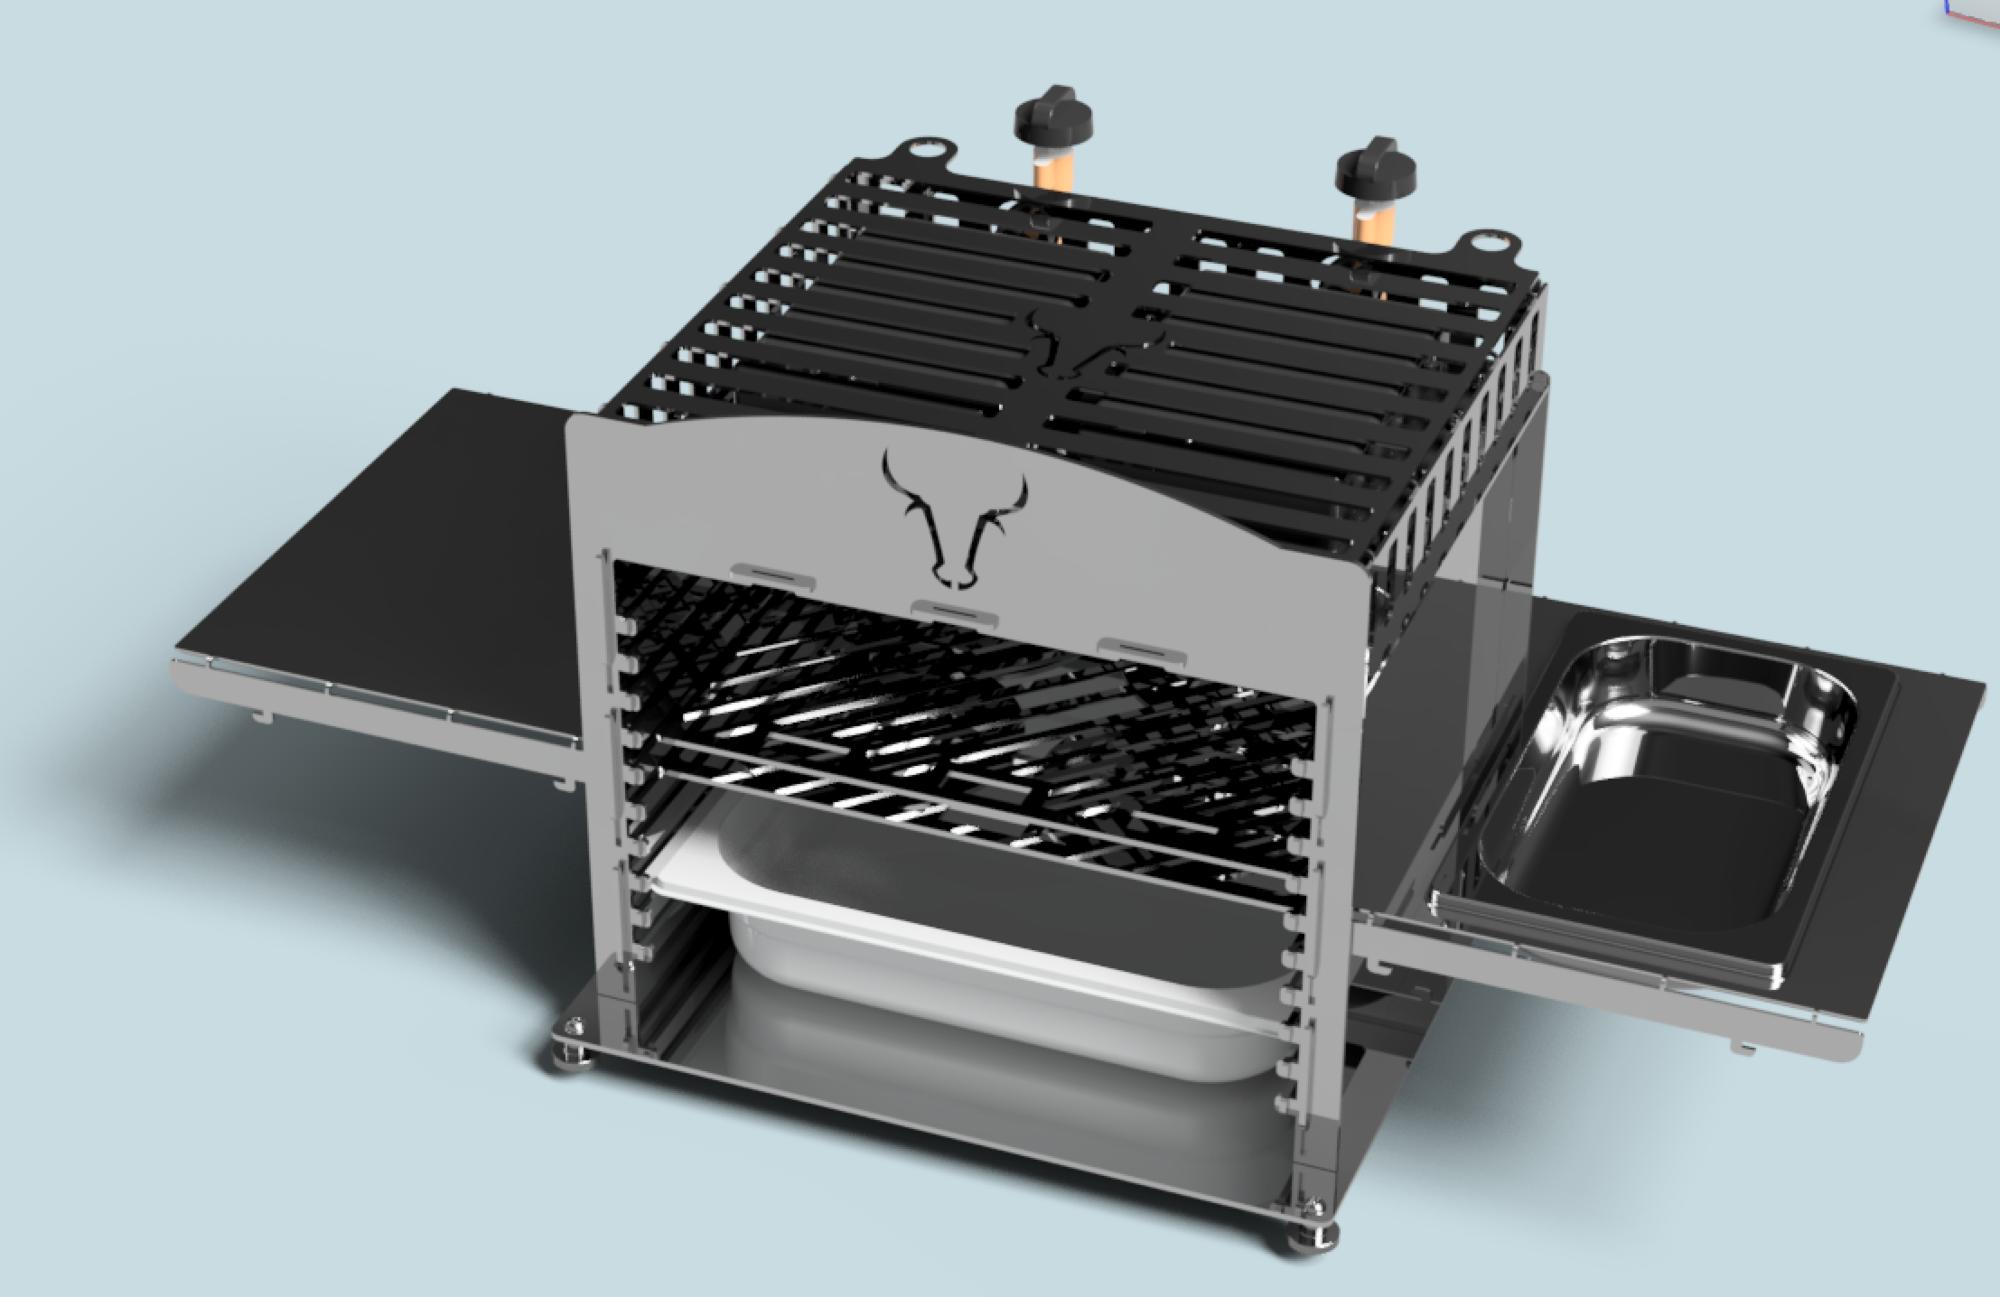 anleitung eigenbau oberhitze grill seite 169. Black Bedroom Furniture Sets. Home Design Ideas